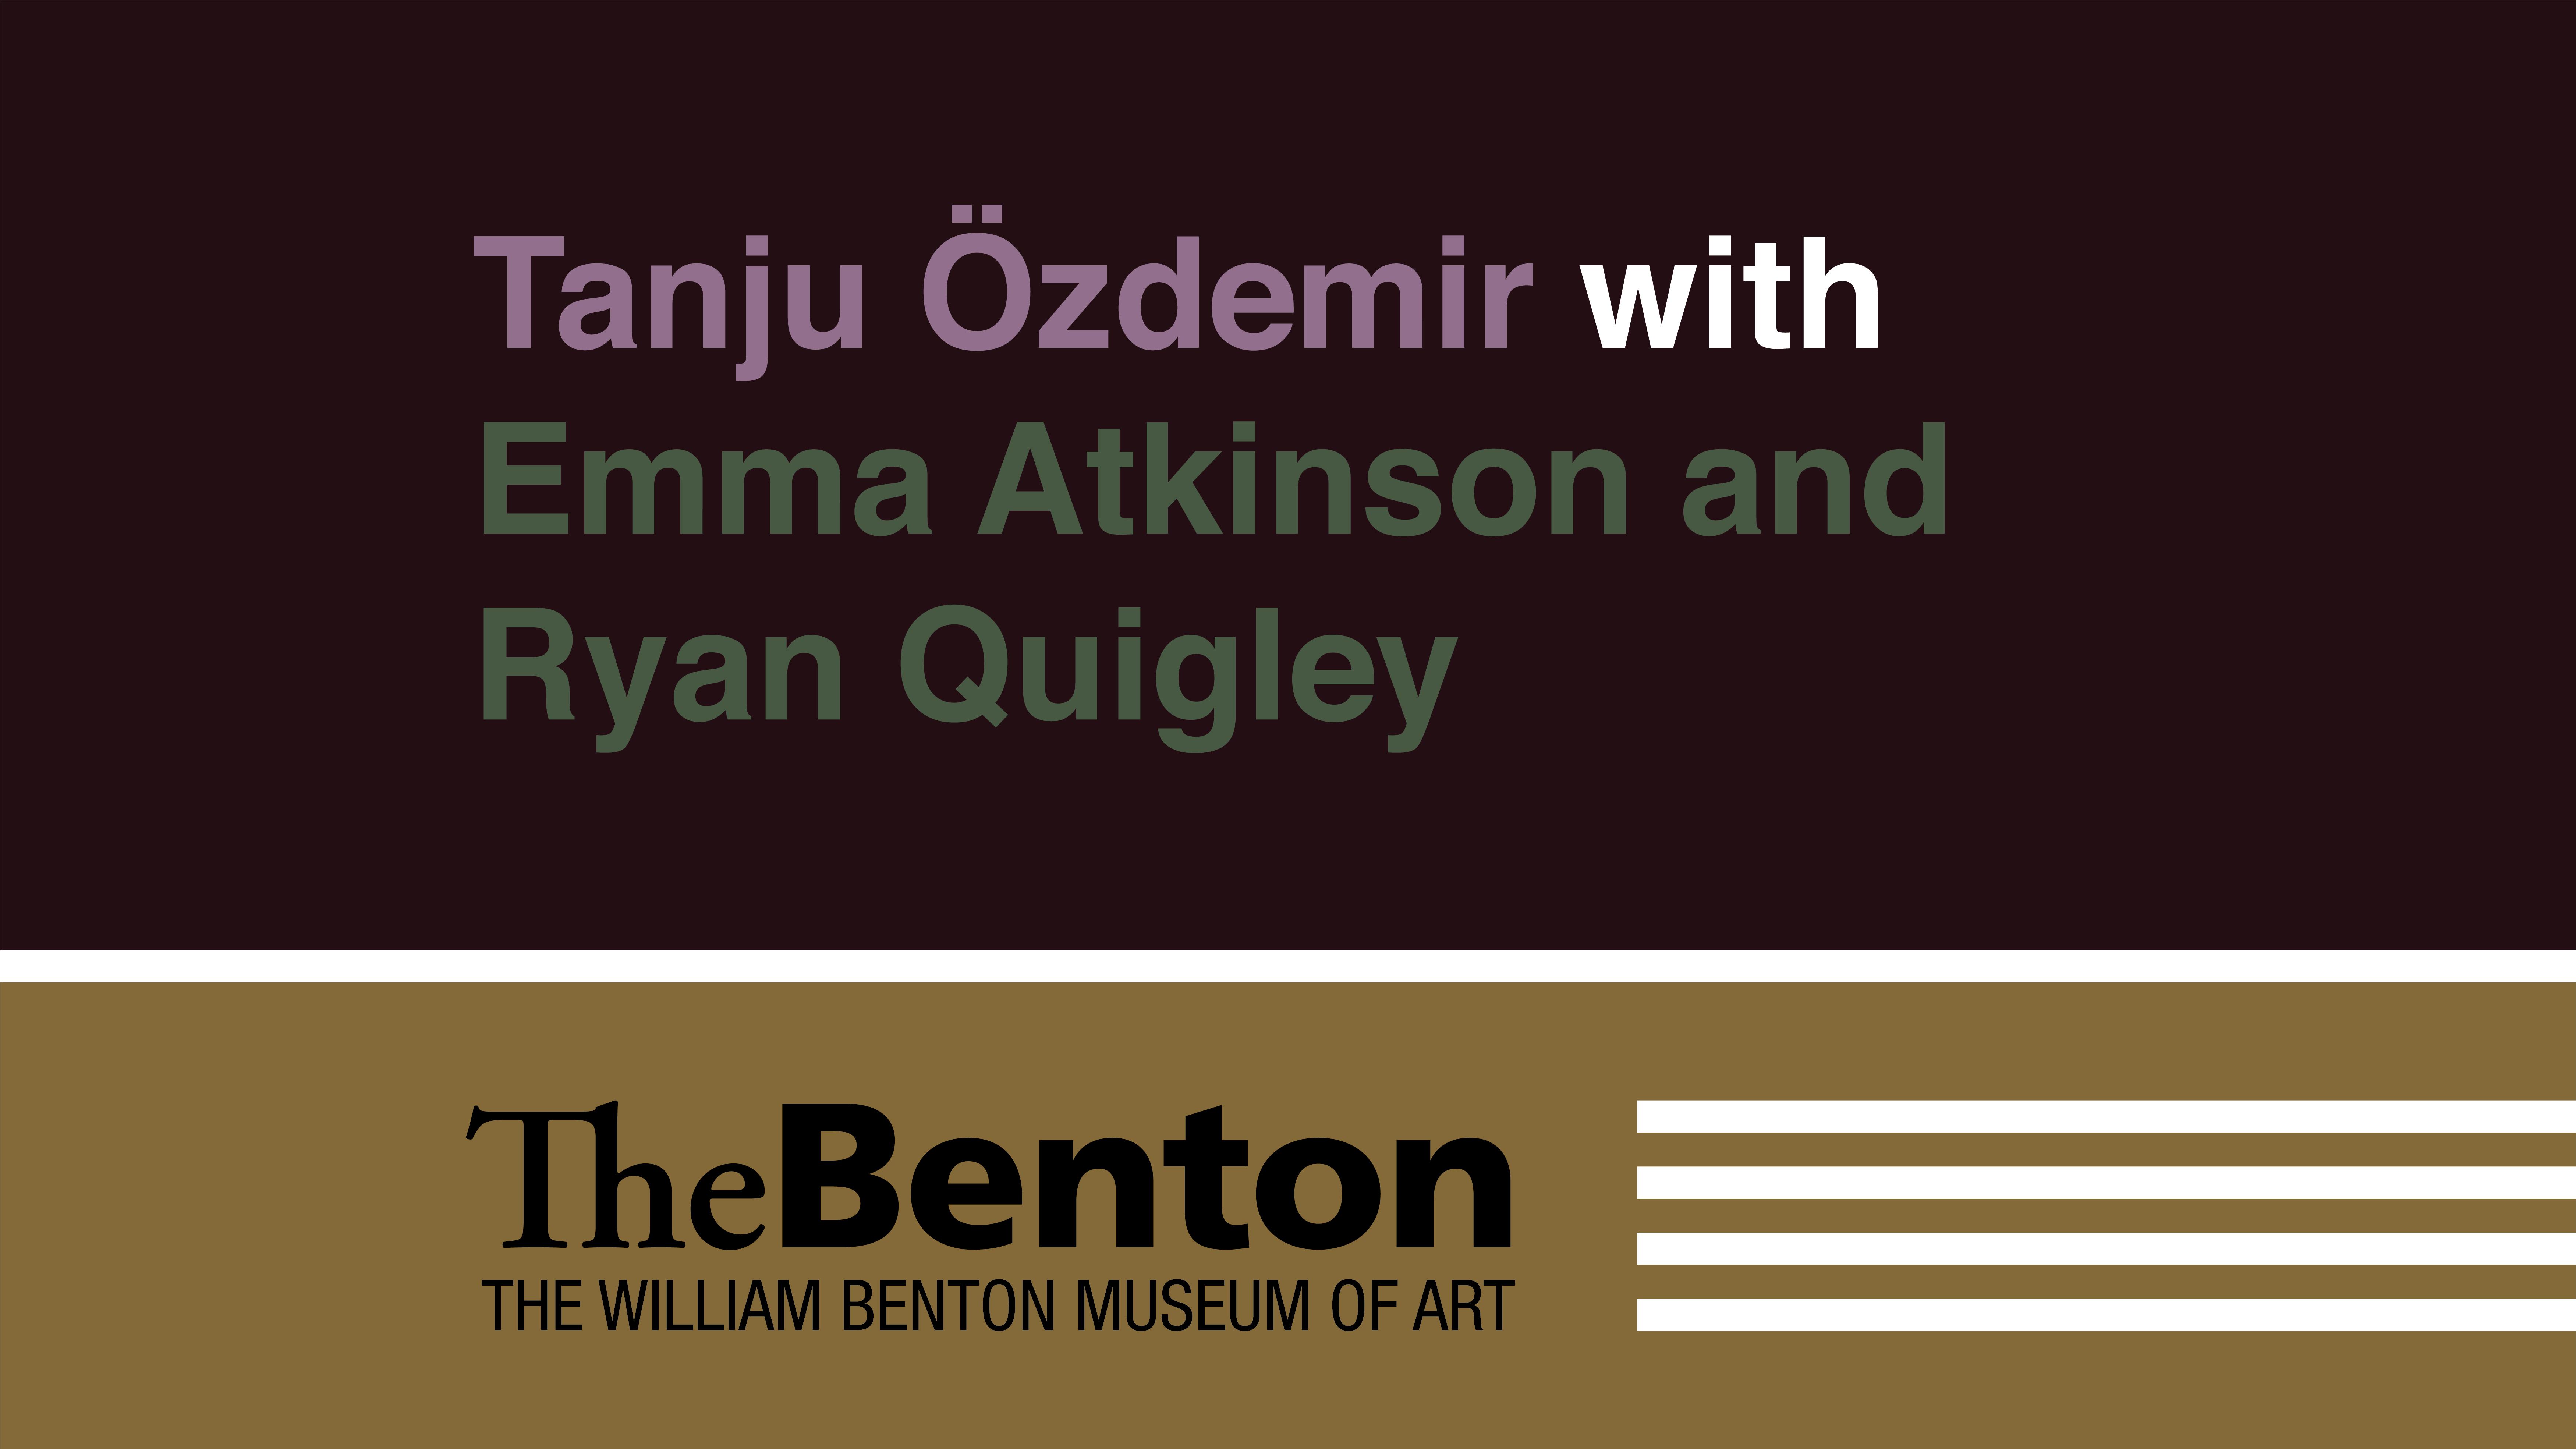 Tanju Özdemir with Emma Atkinson and Ryan Quigley